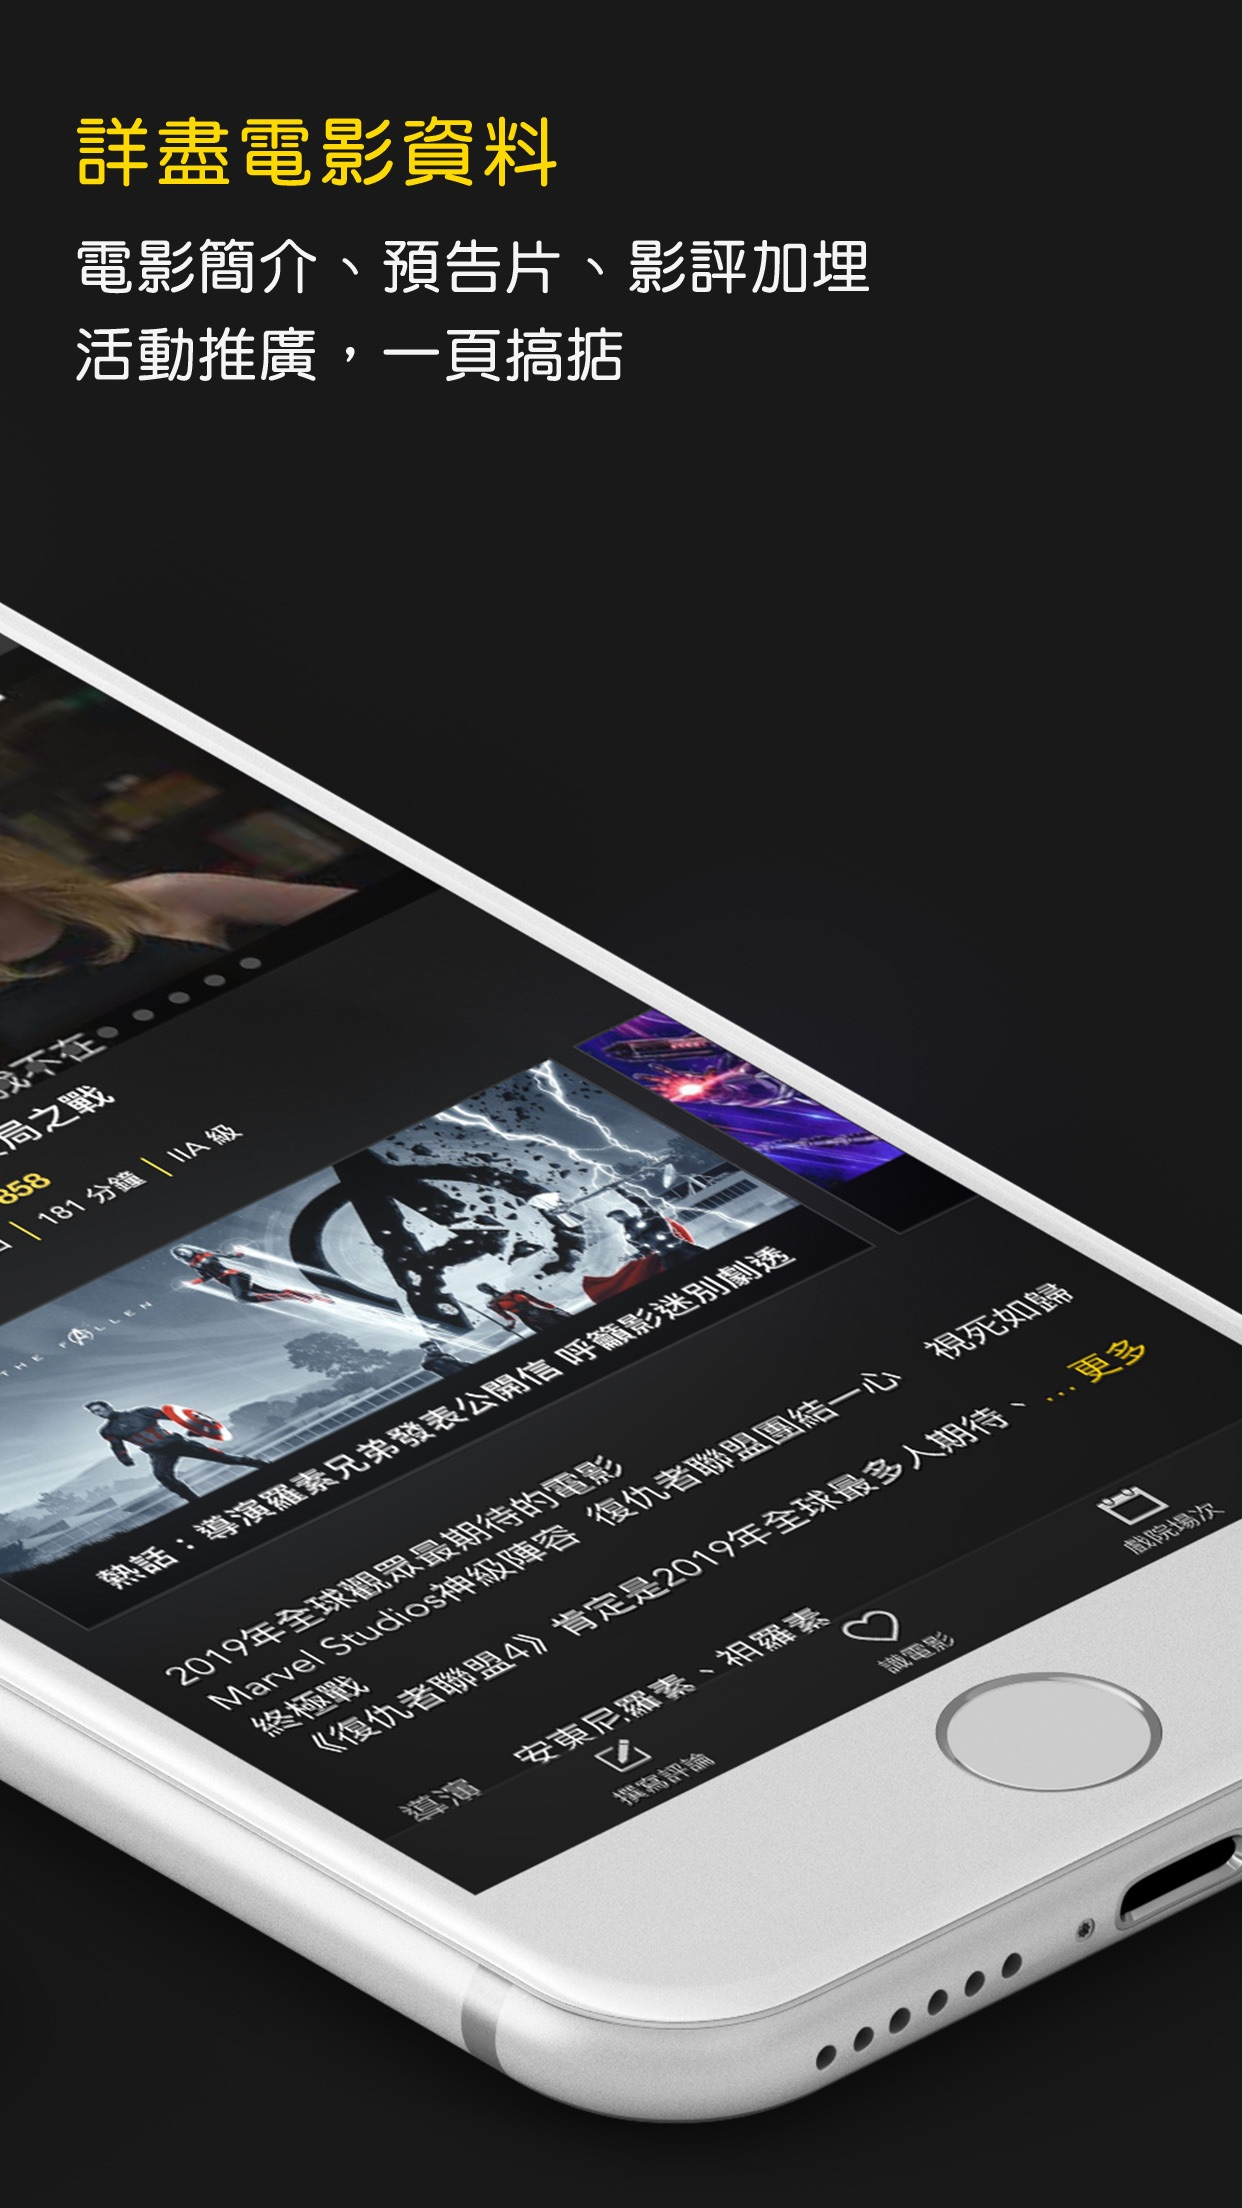 Hong Kong Movie 香港電影 Screenshot